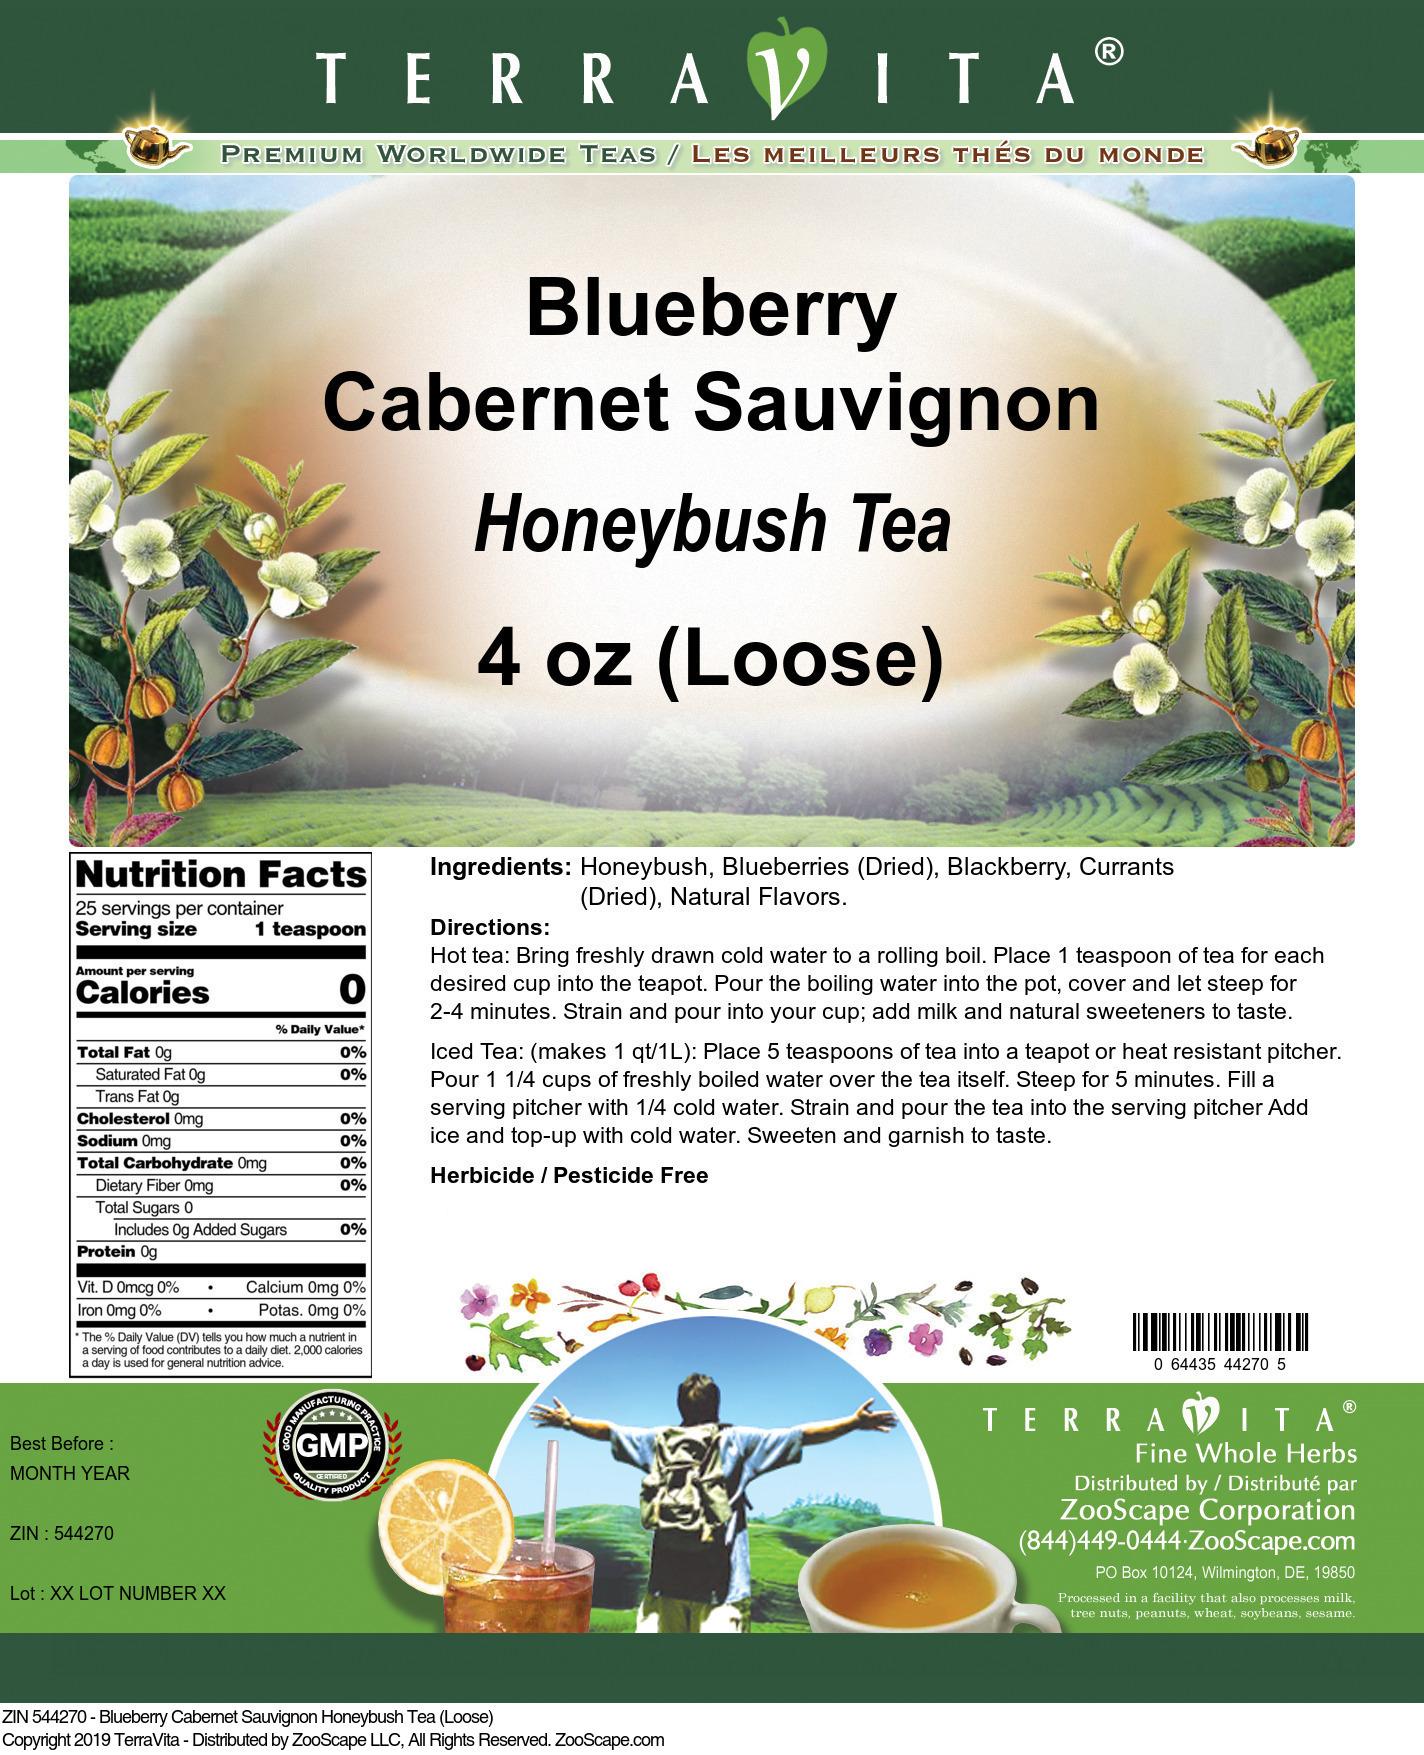 Blueberry Cabernet Sauvignon Honeybush Tea (Loose)